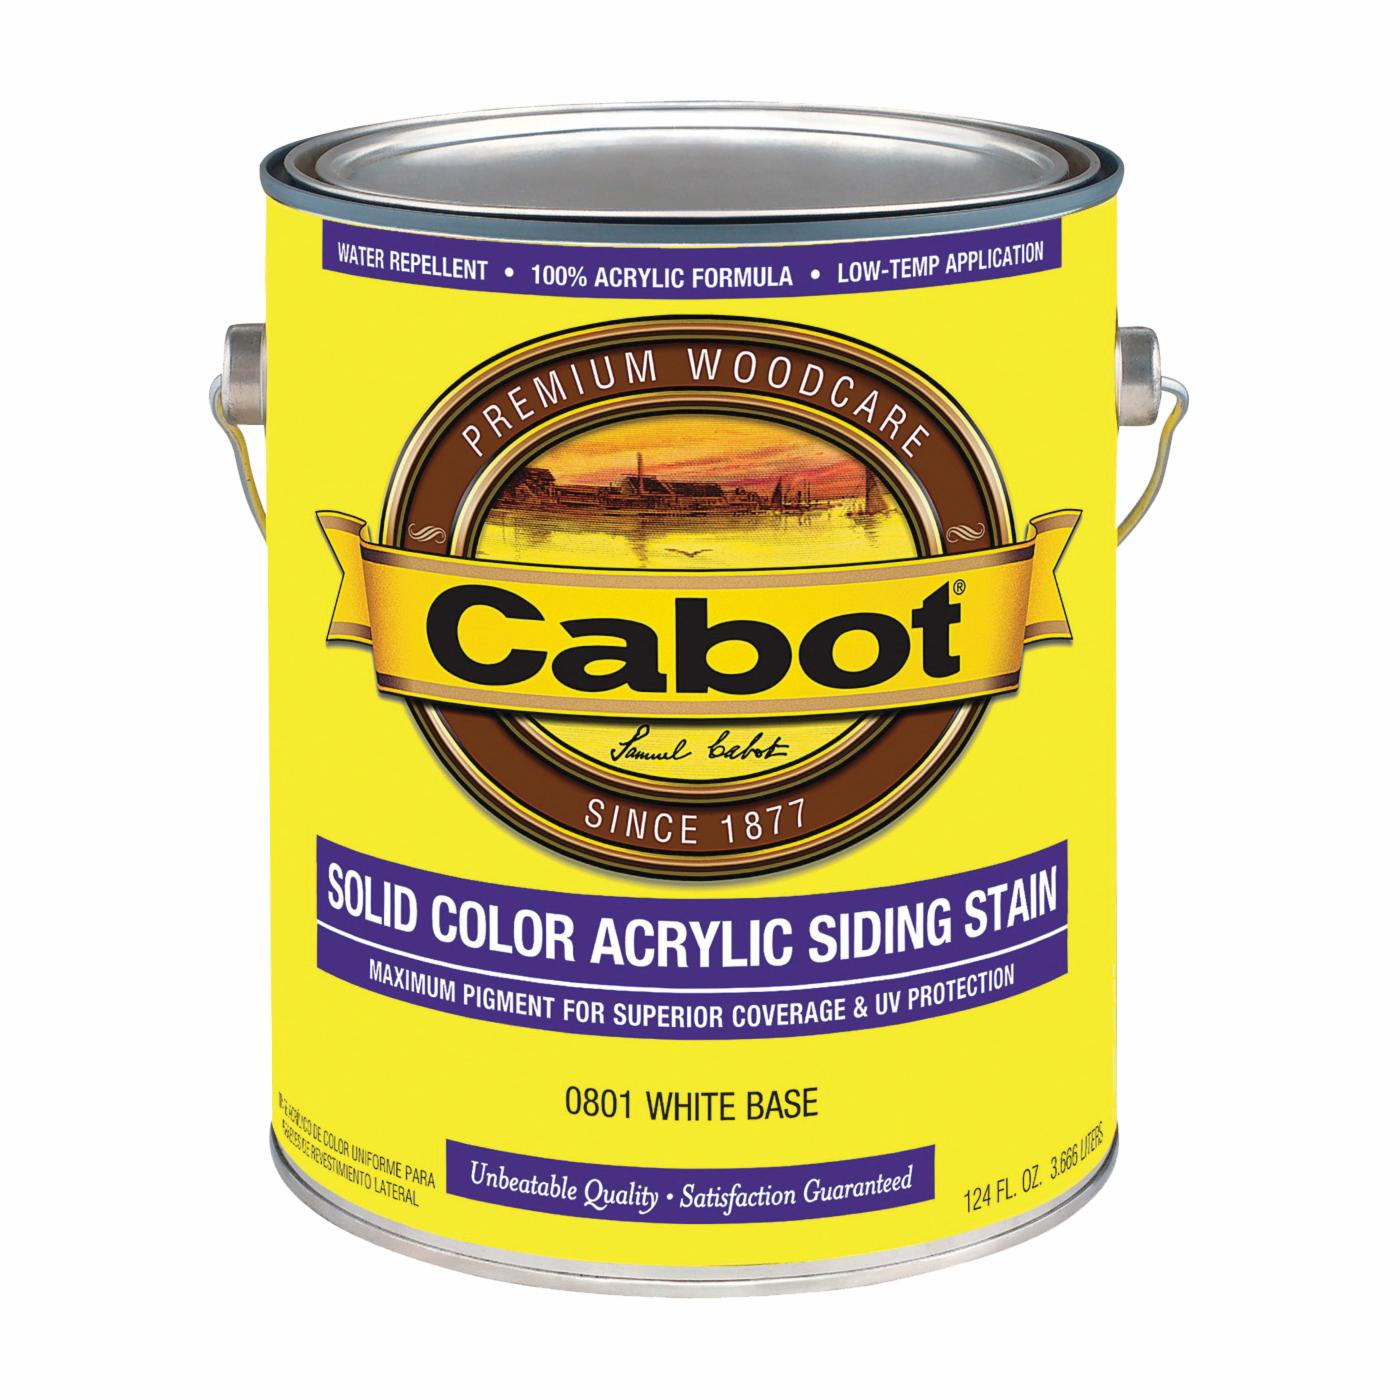 Cabot 801